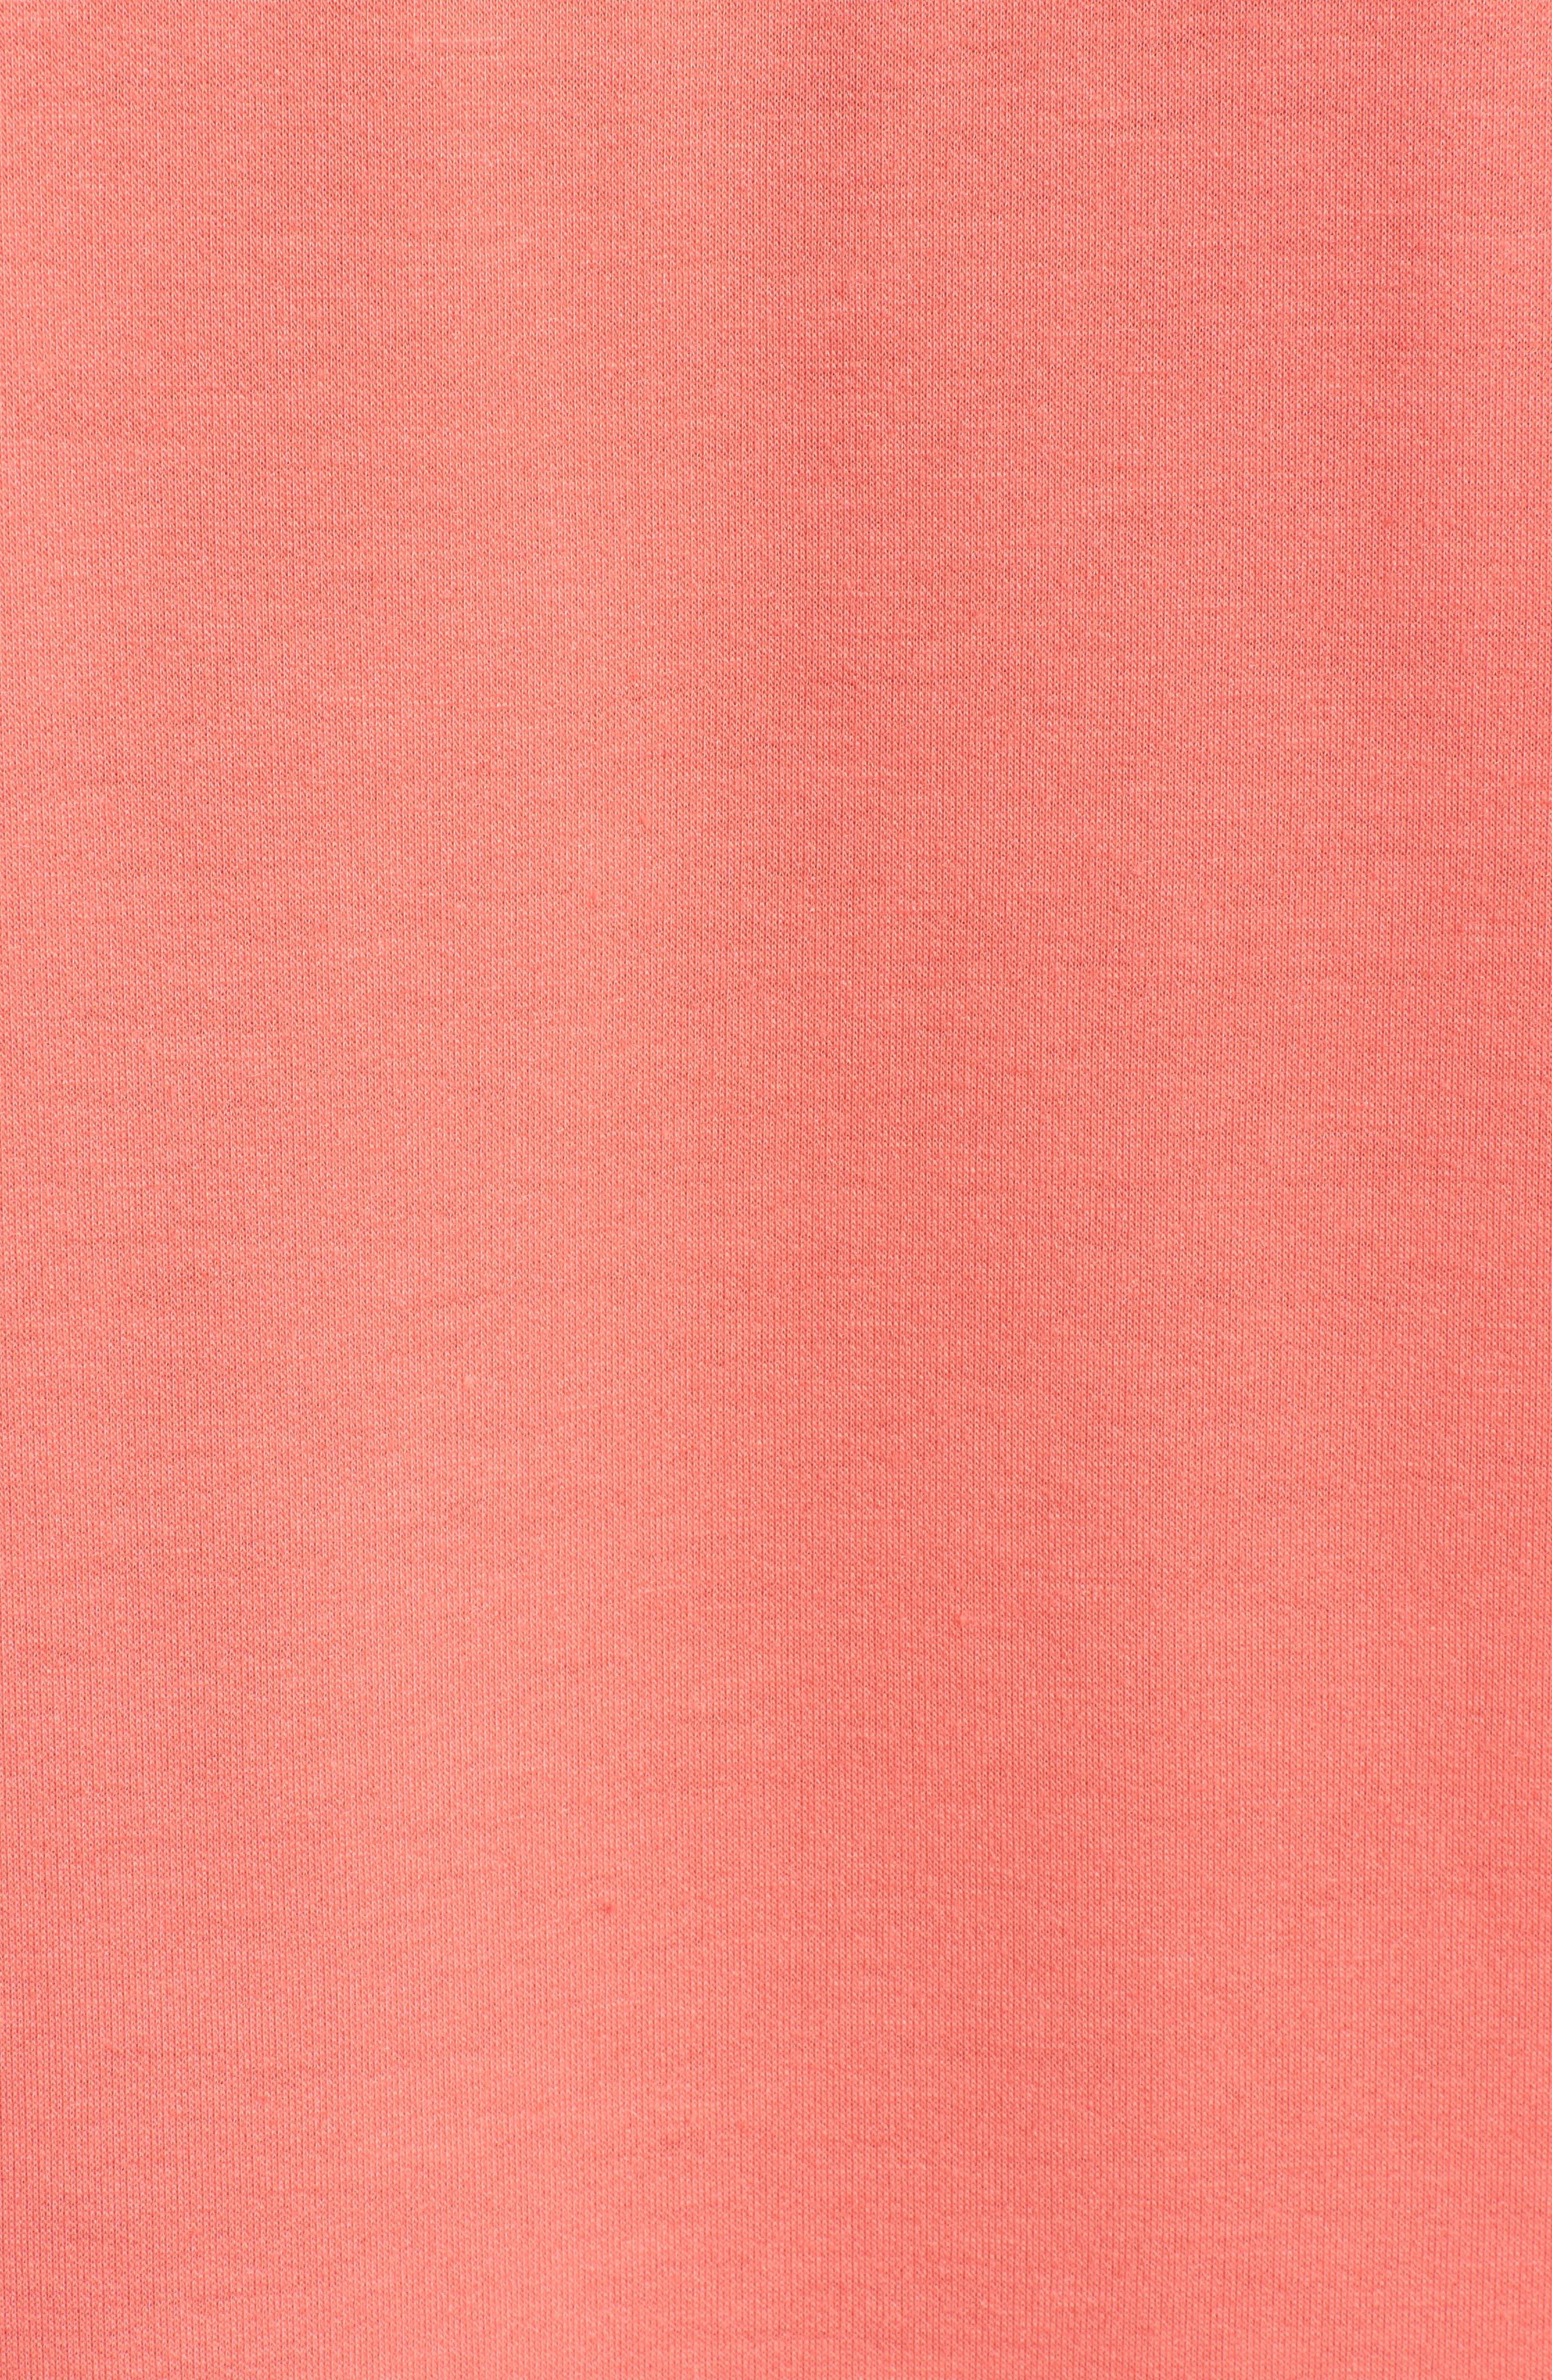 Ruffle Sleeve Sweatshirt,                             Alternate thumbnail 20, color,